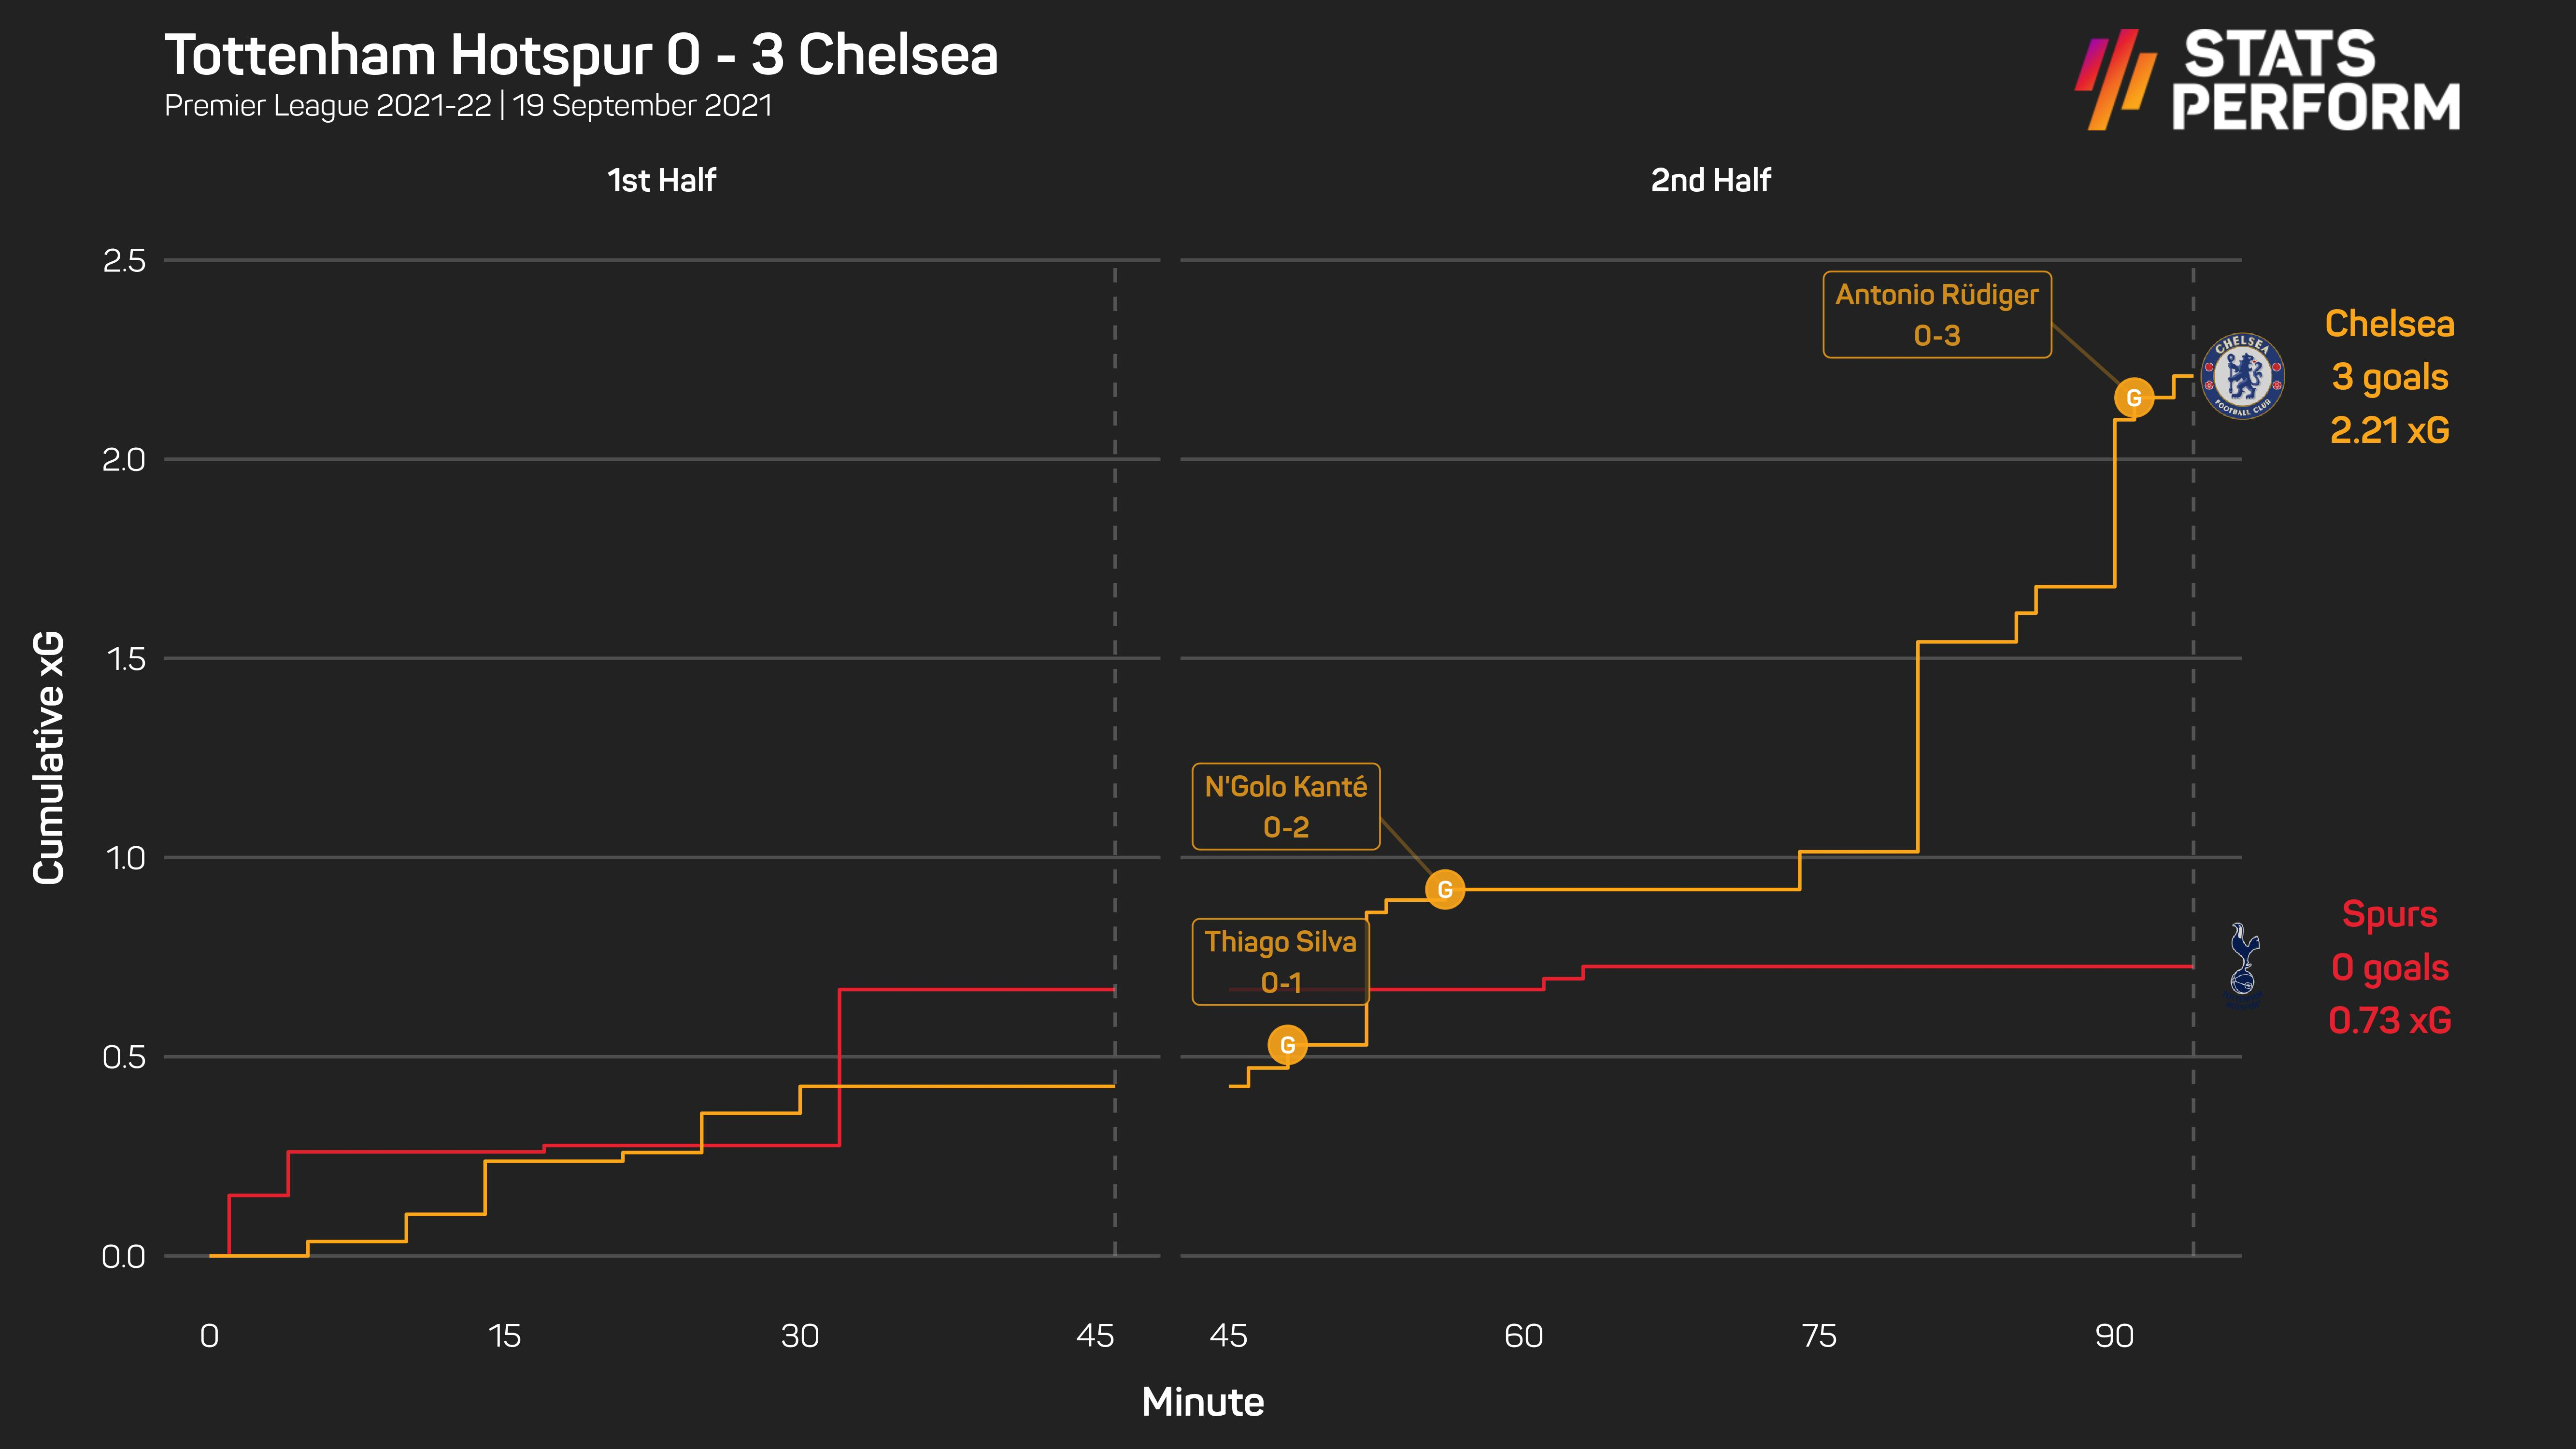 Chelsea beat Tottenham in the Premier League